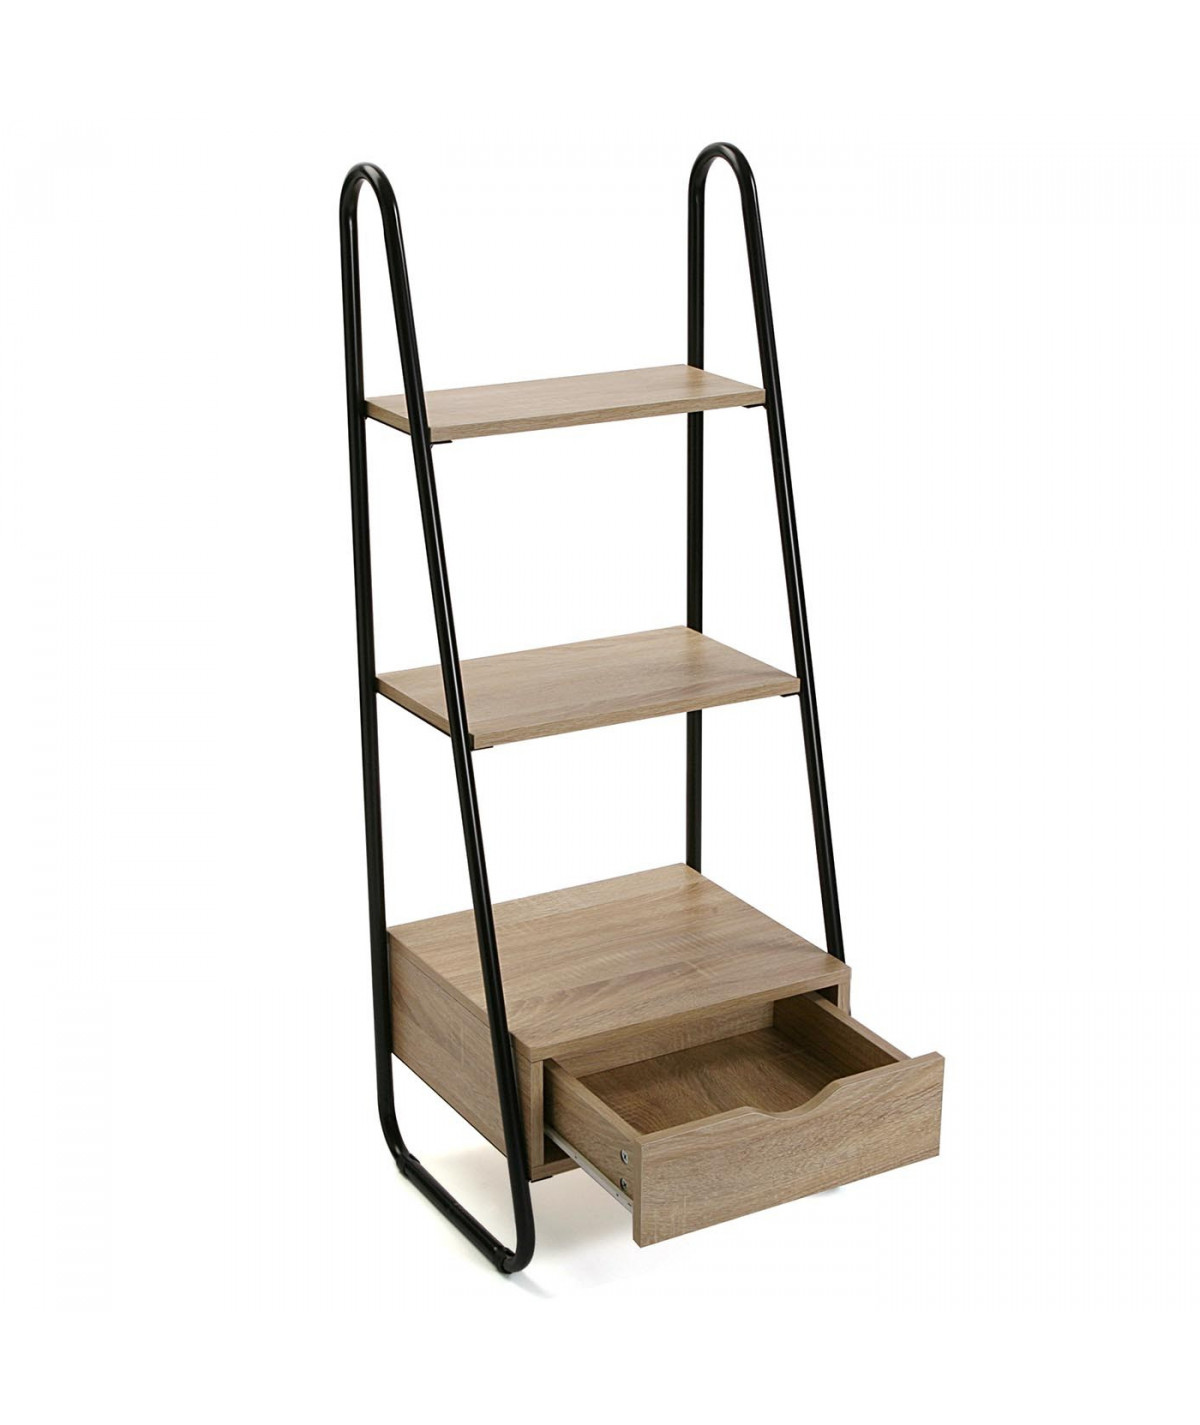 Meuble de rangement à 2 étagères 1 tiroir bas - Eva |YESDEKO